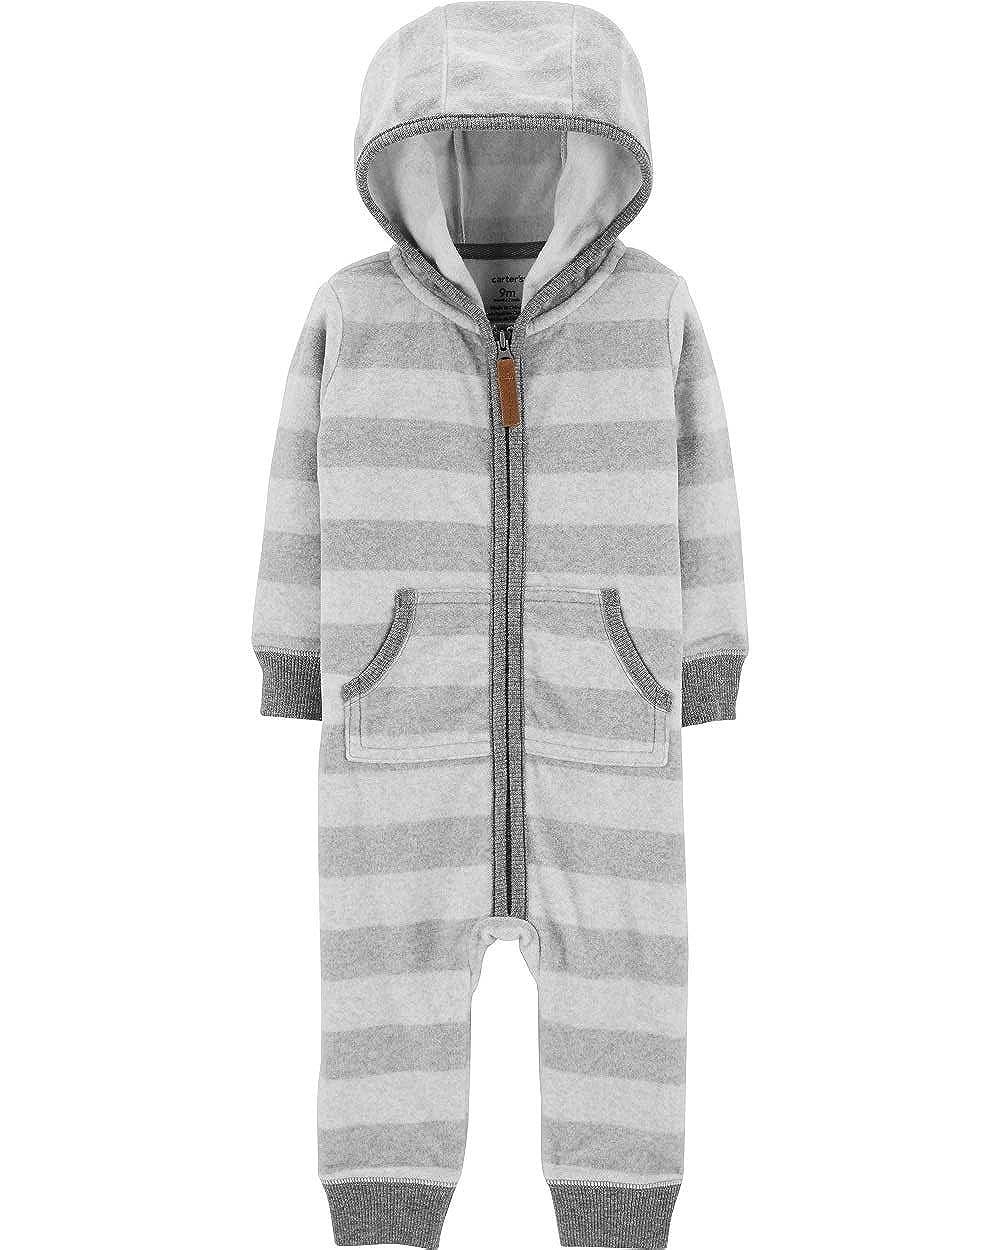 Newborn Grey Carters Baby Boys Fleece Striped Hooded Jumper